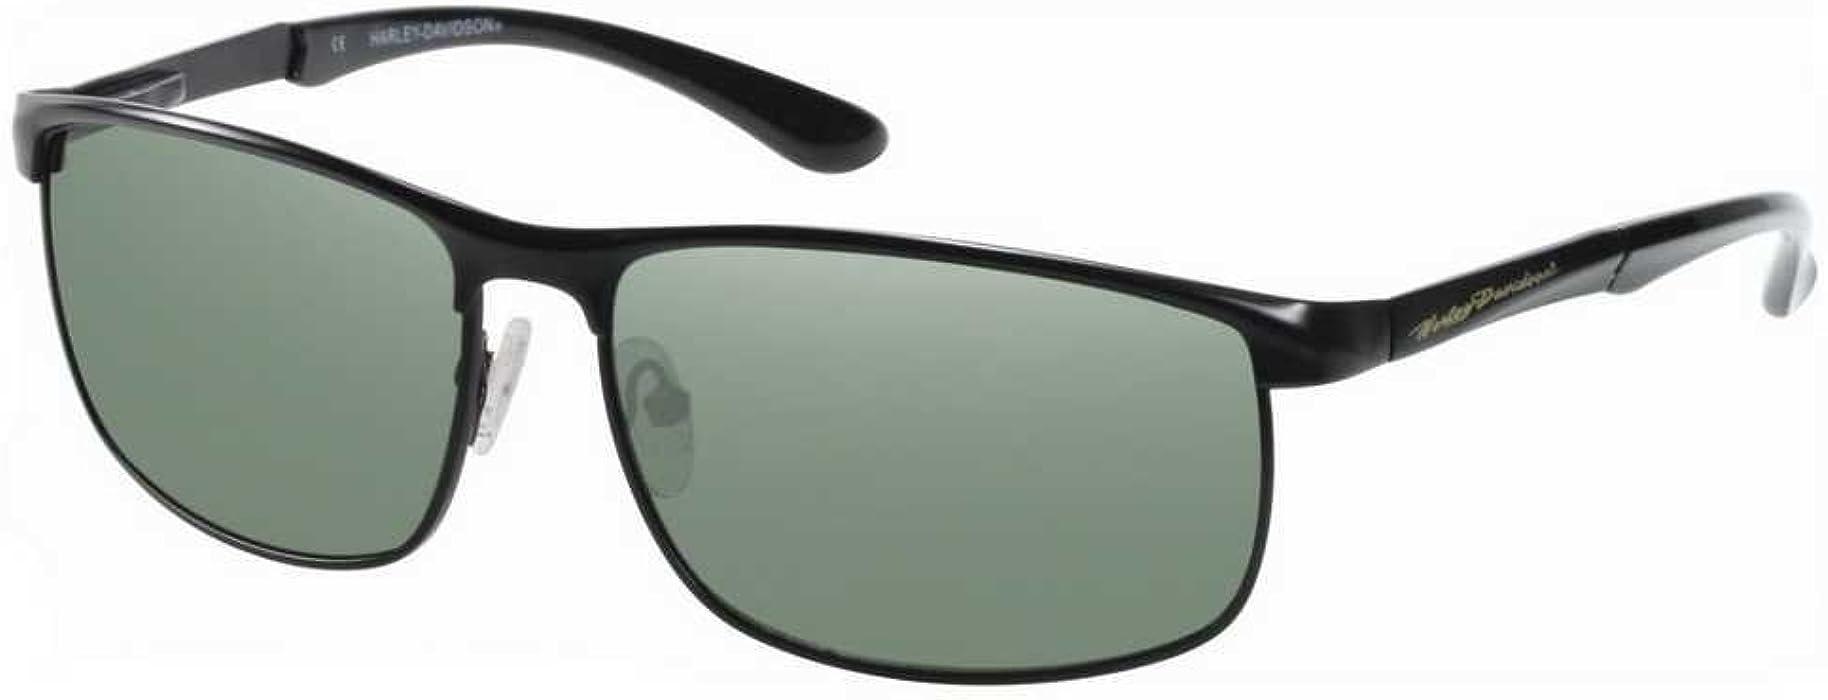 703a98206017c Harley-Davidson Men s Sunglasses